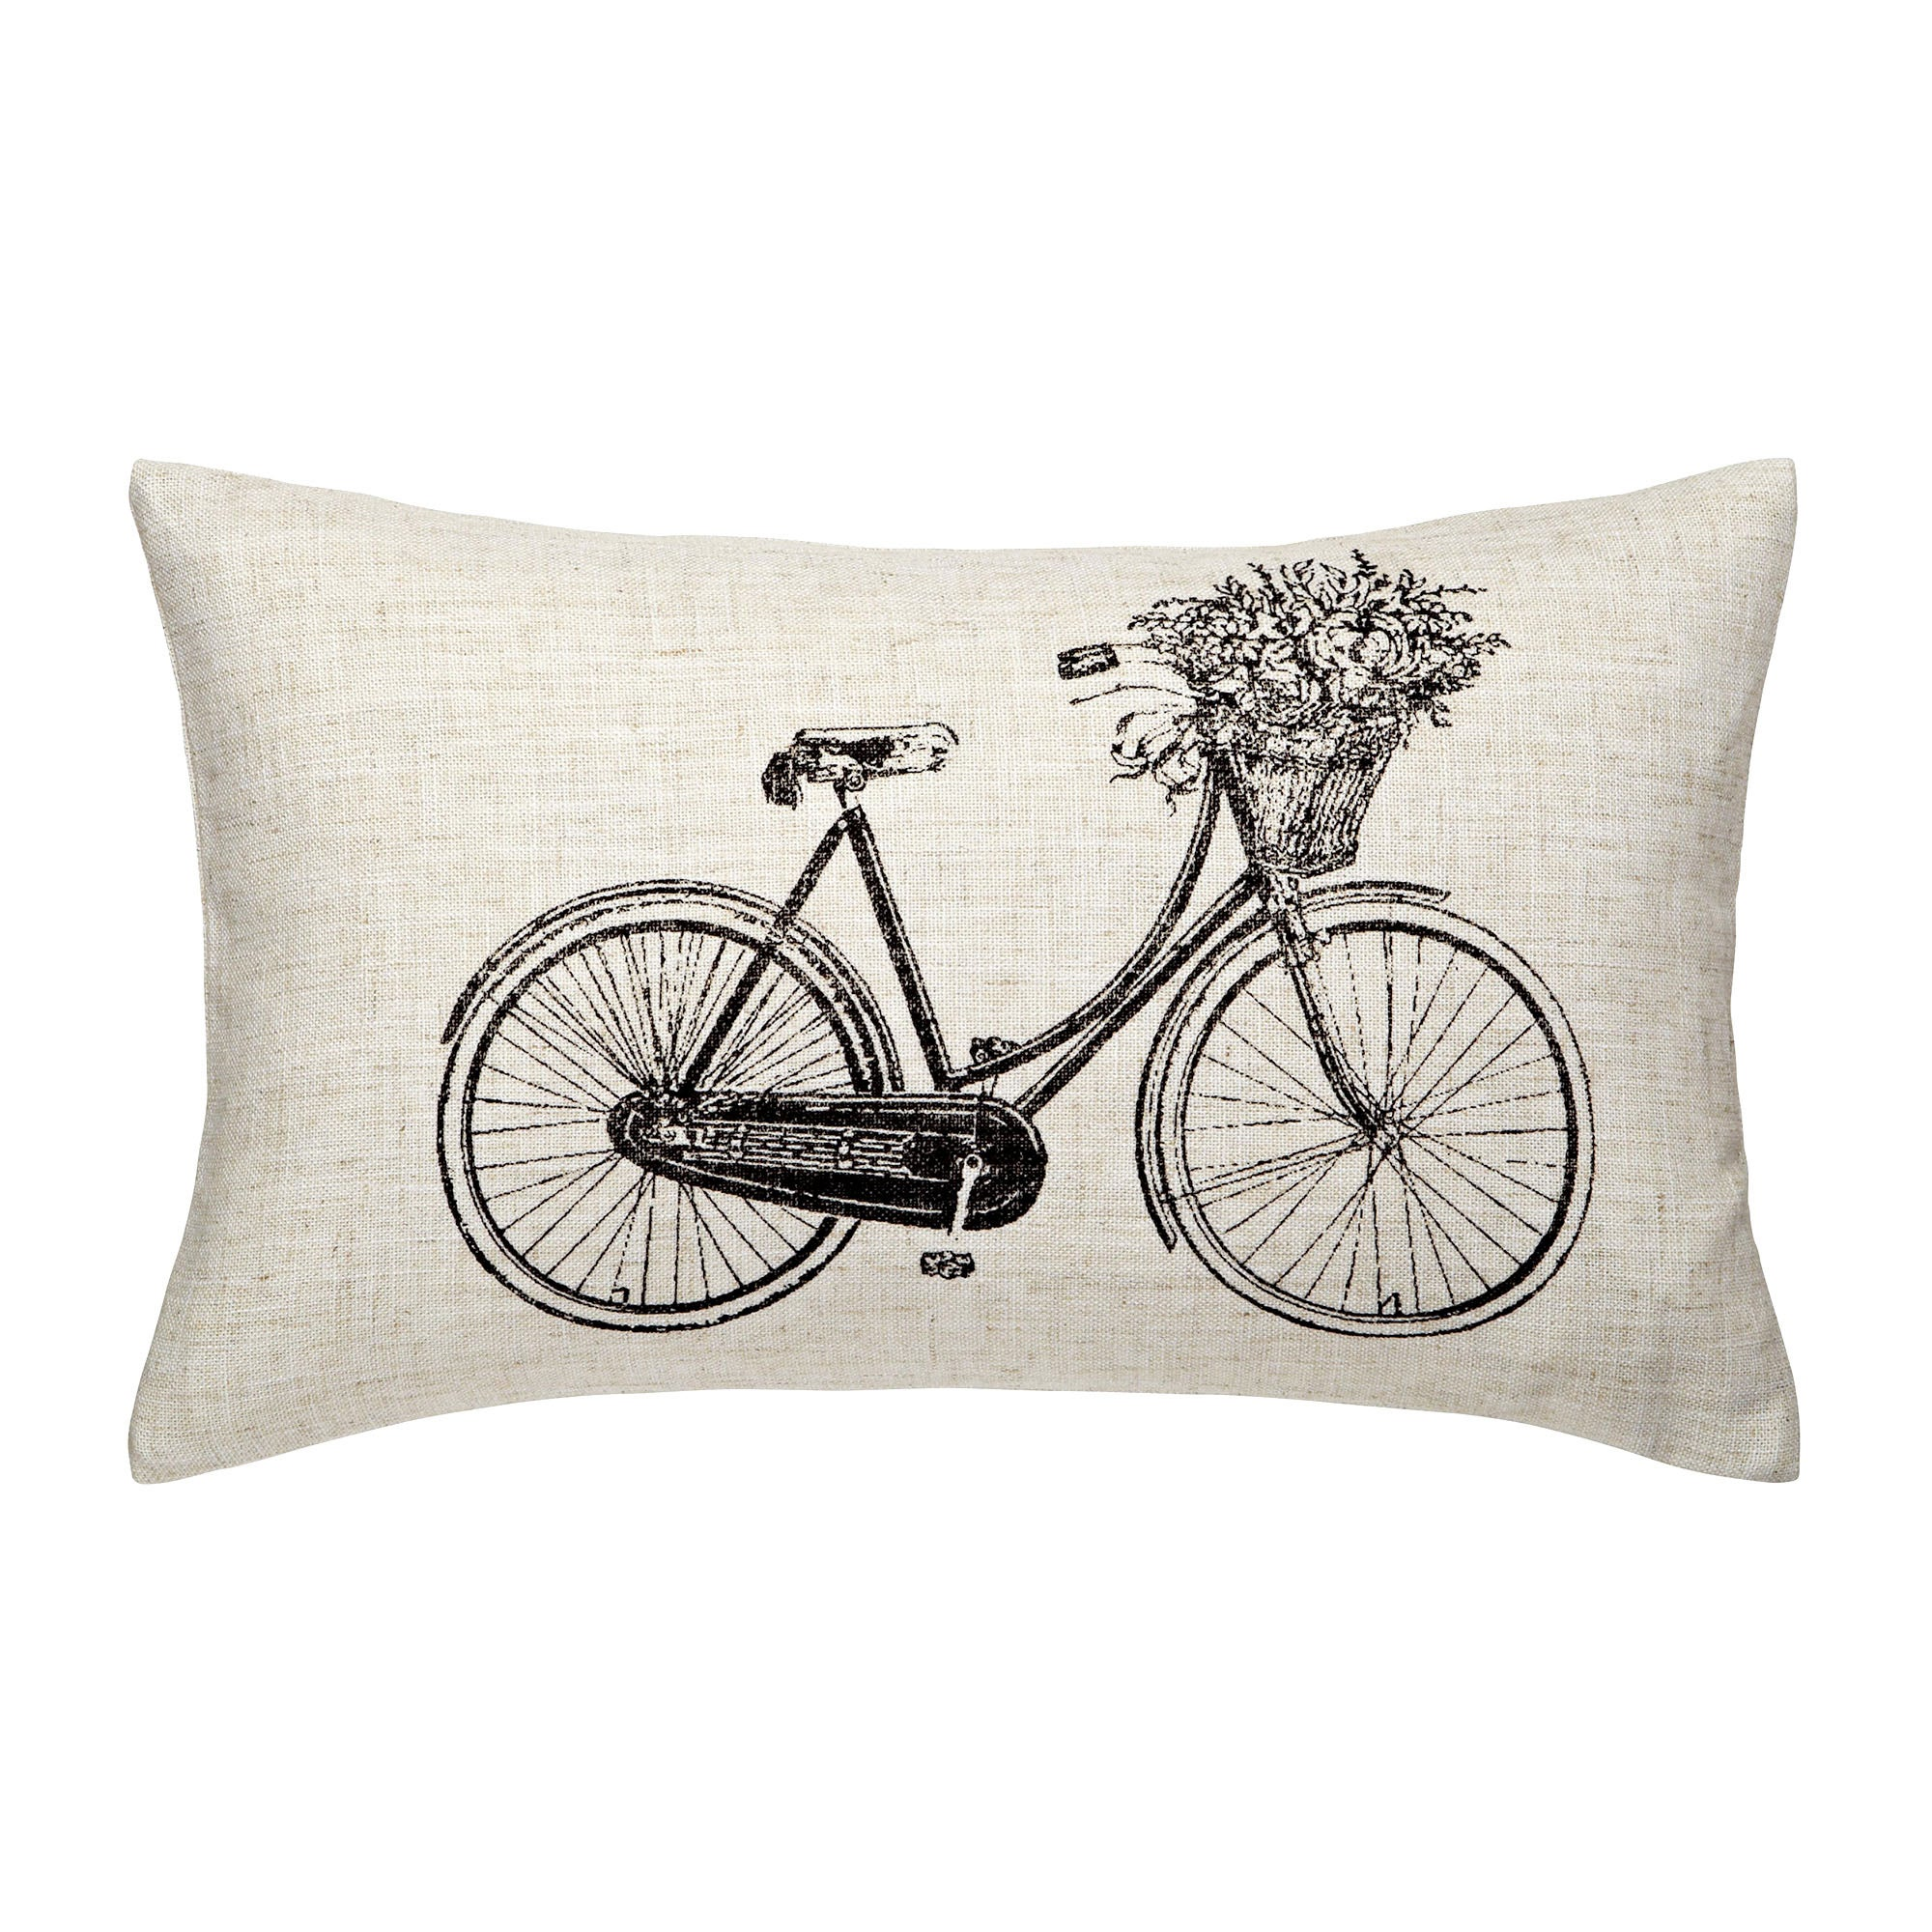 Bike with Flowers Cushion